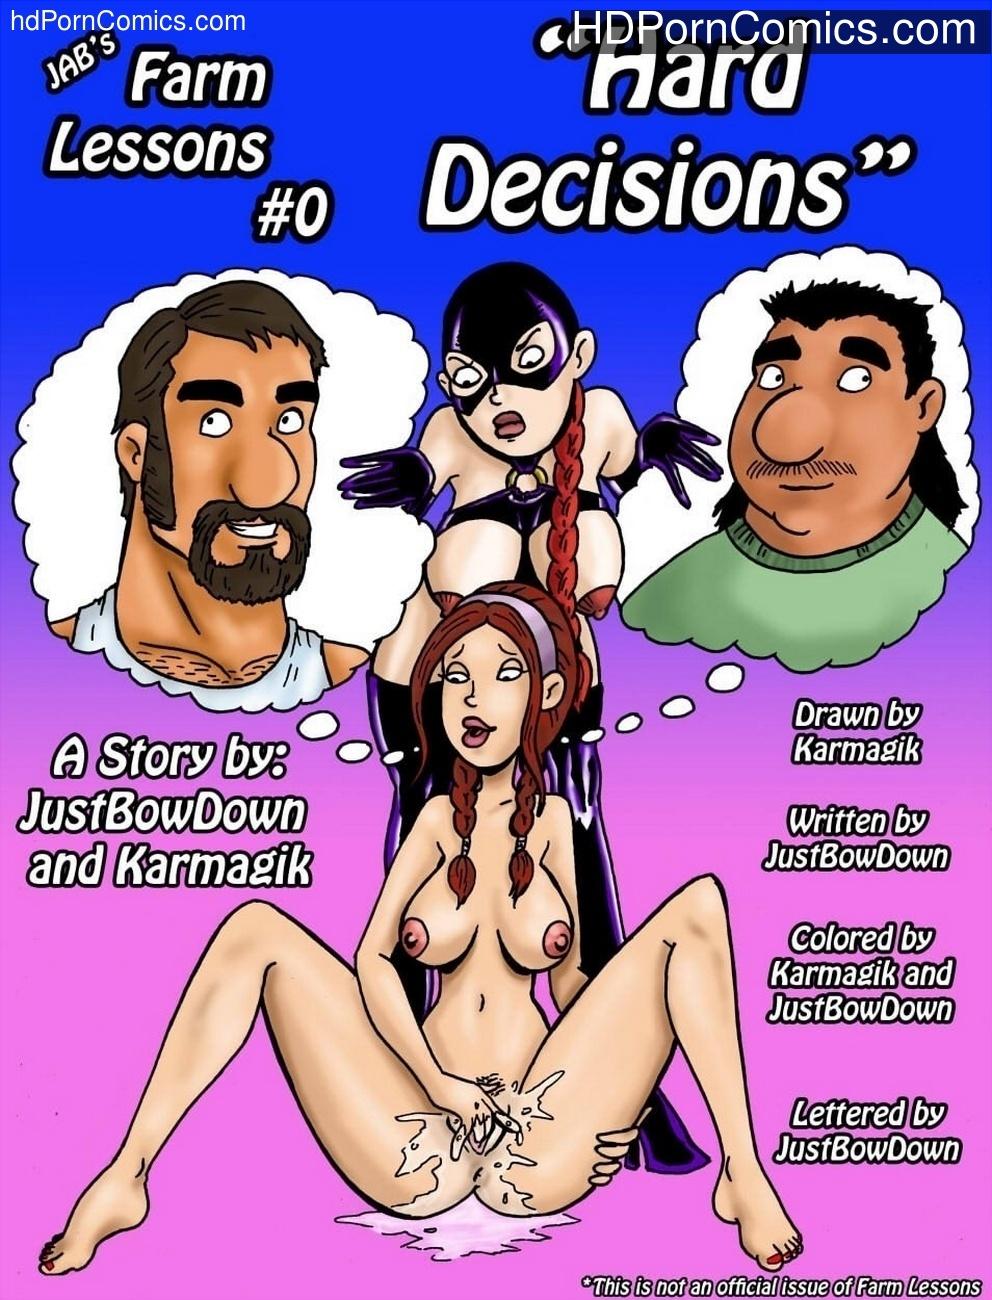 Farm Lessons 0 - Hard Decisions 1 free sex comic